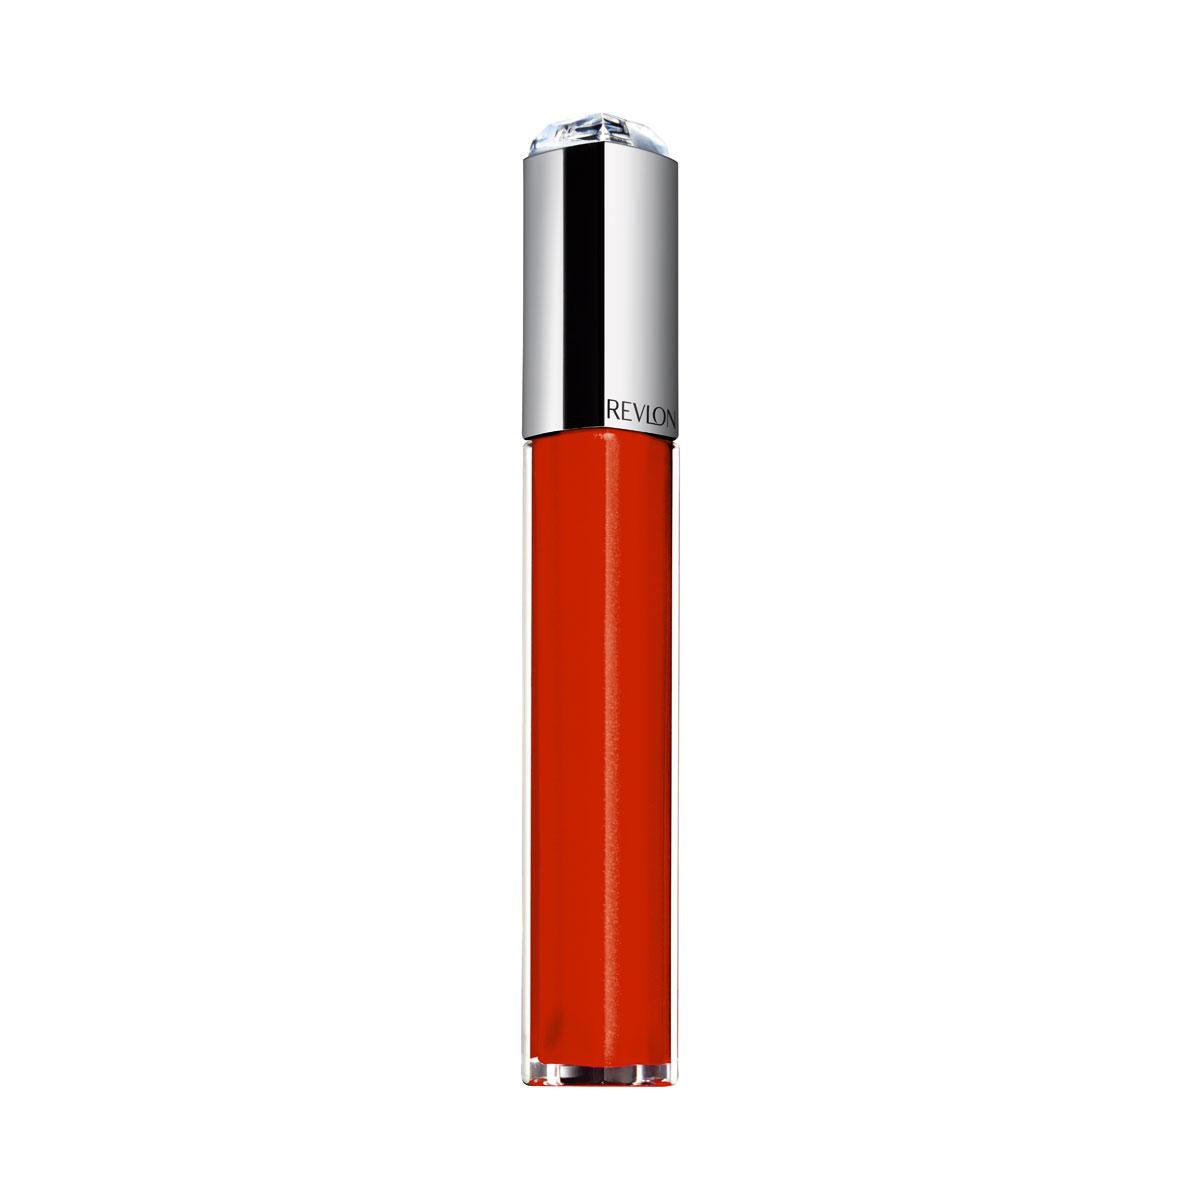 Фото Revlon Помада-блеск для Губ Ultra Hd Lip Lacquer Fire opal 560 5,9 мл. Купить  в РФ